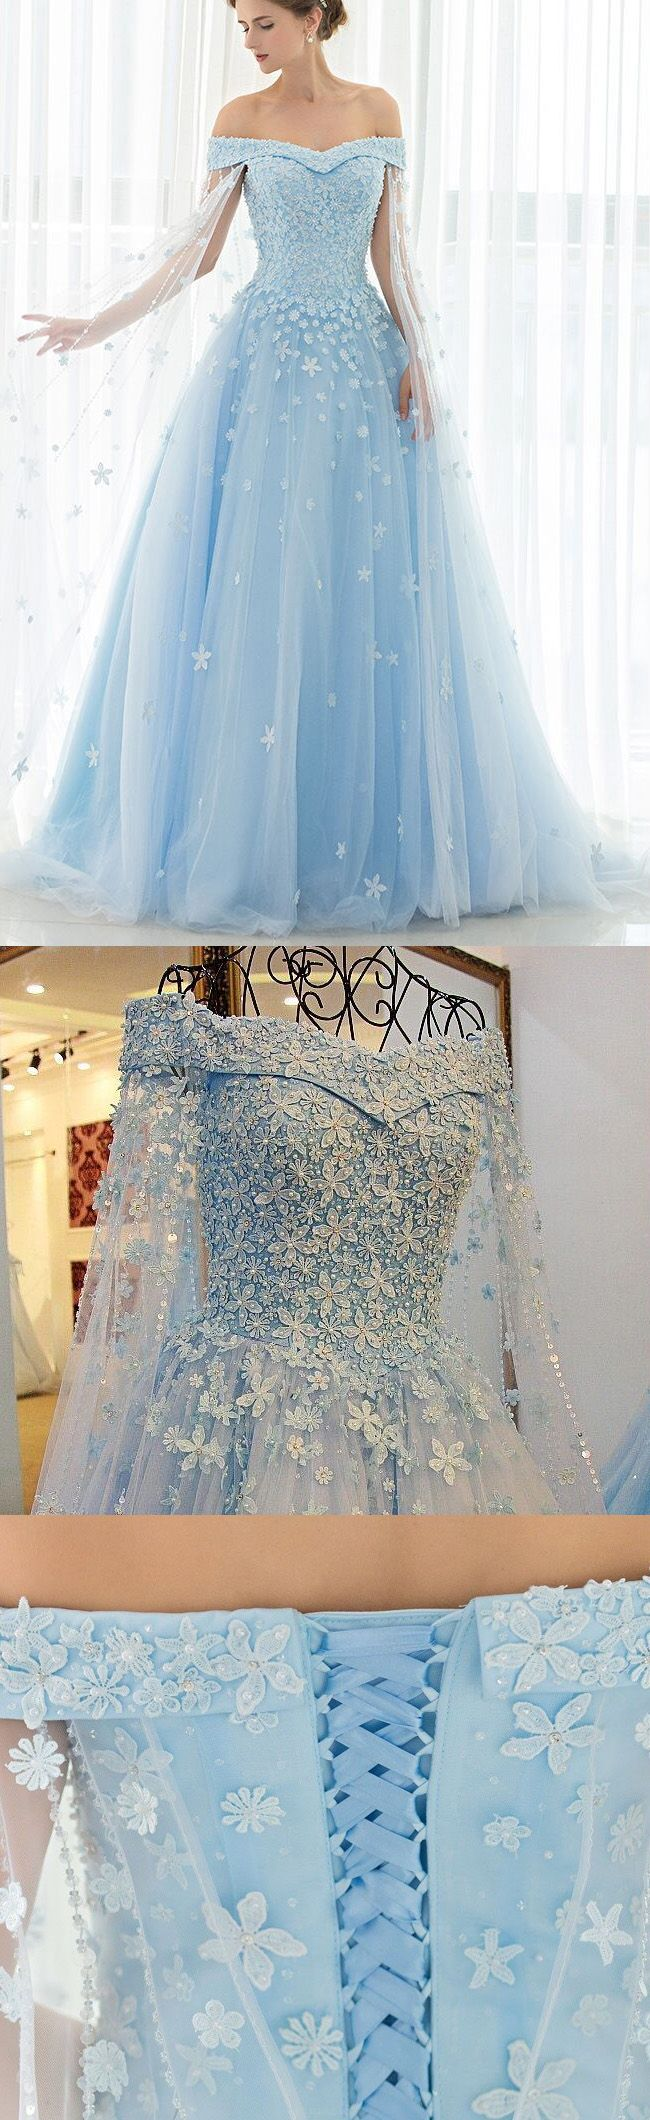 Hot Sale A-line/Princess Prom Evening Dresses Long Light Blue ...